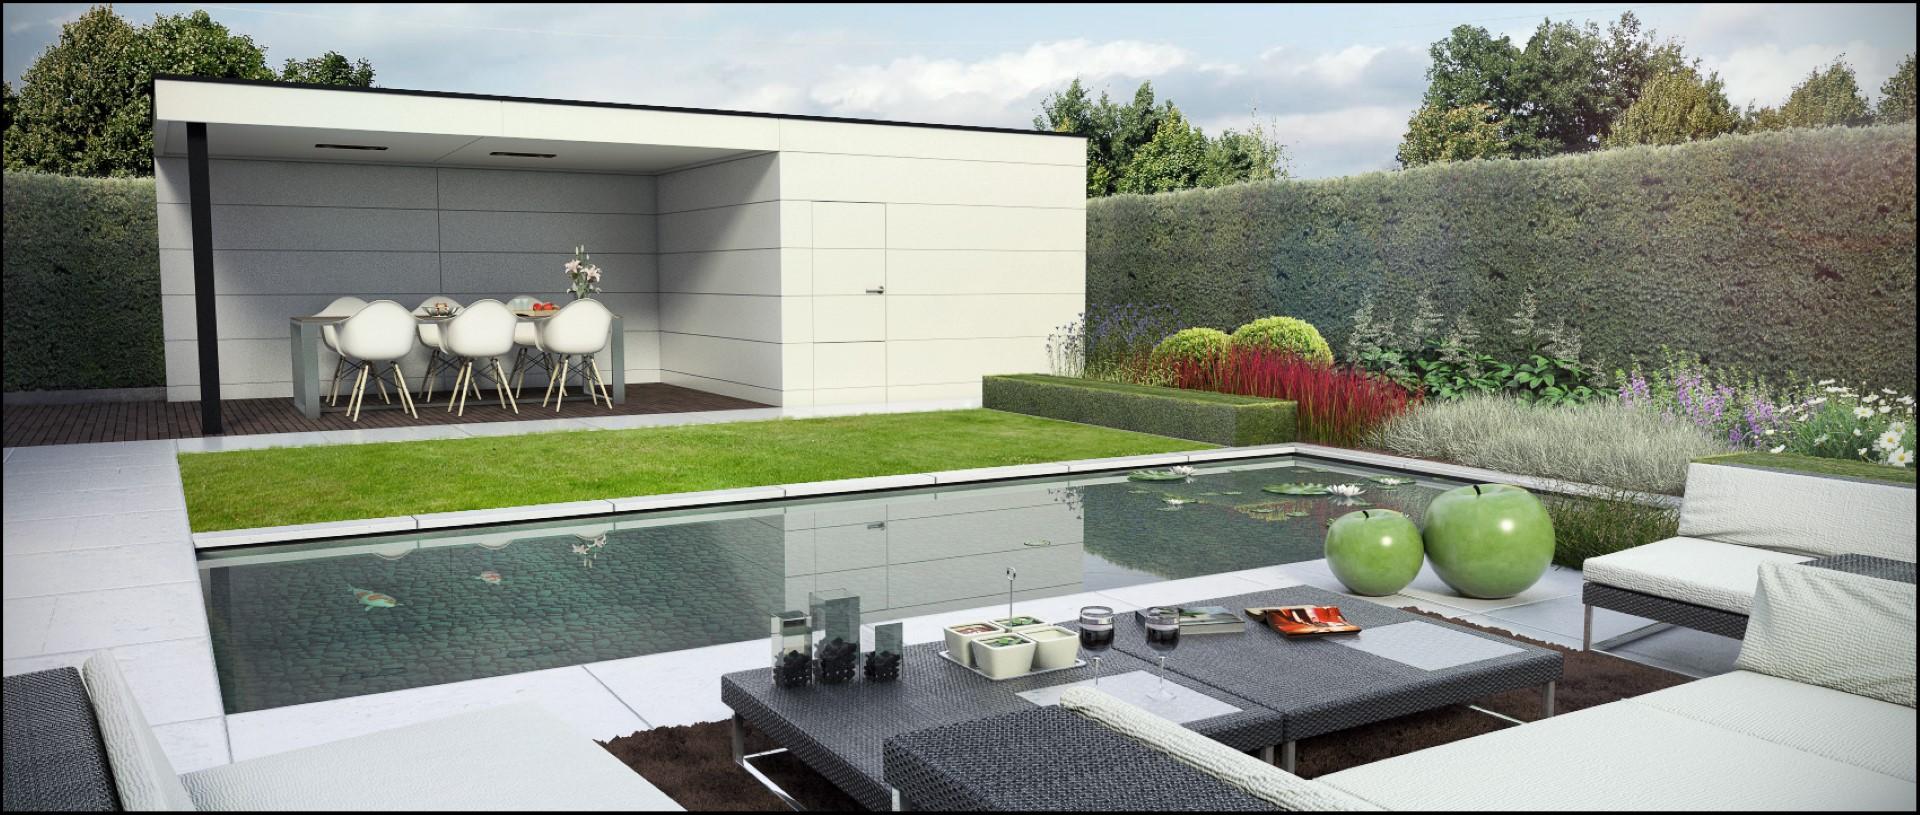 Moderne tuinen loungeset 2017 - Tuin ontwerp foto ...